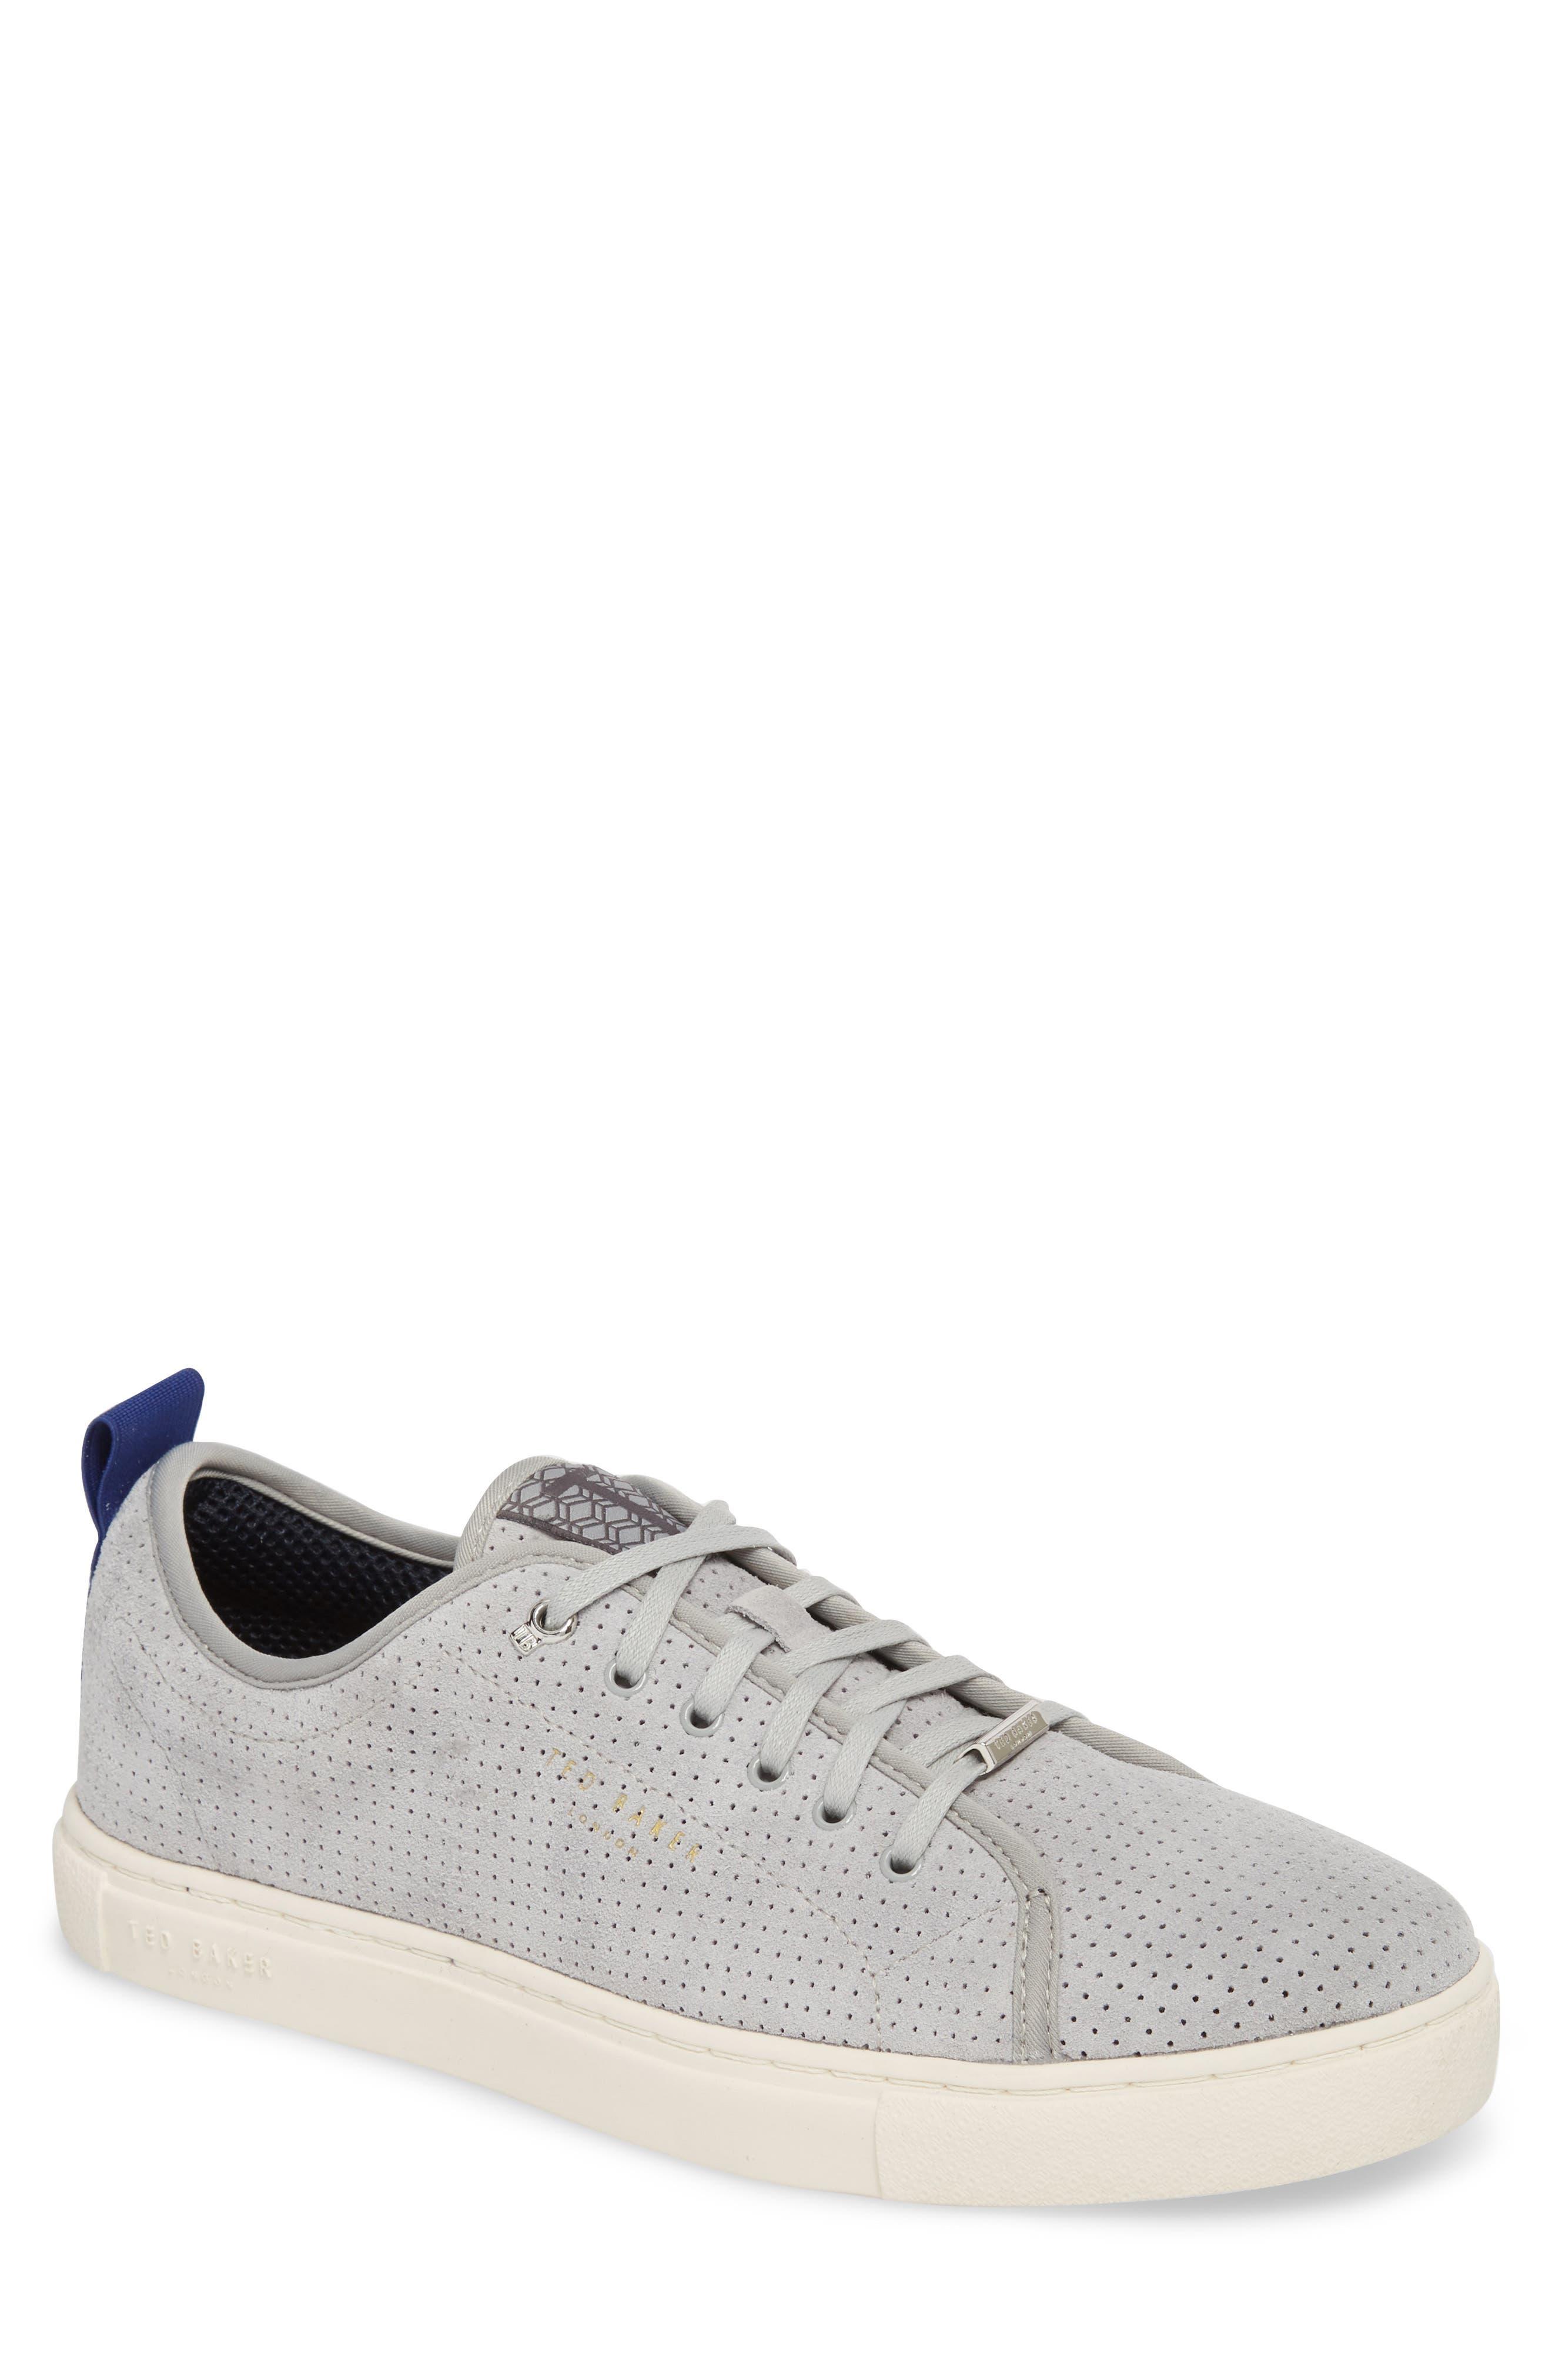 Kaliix Perforated Low Top Sneaker,                         Main,                         color, 070